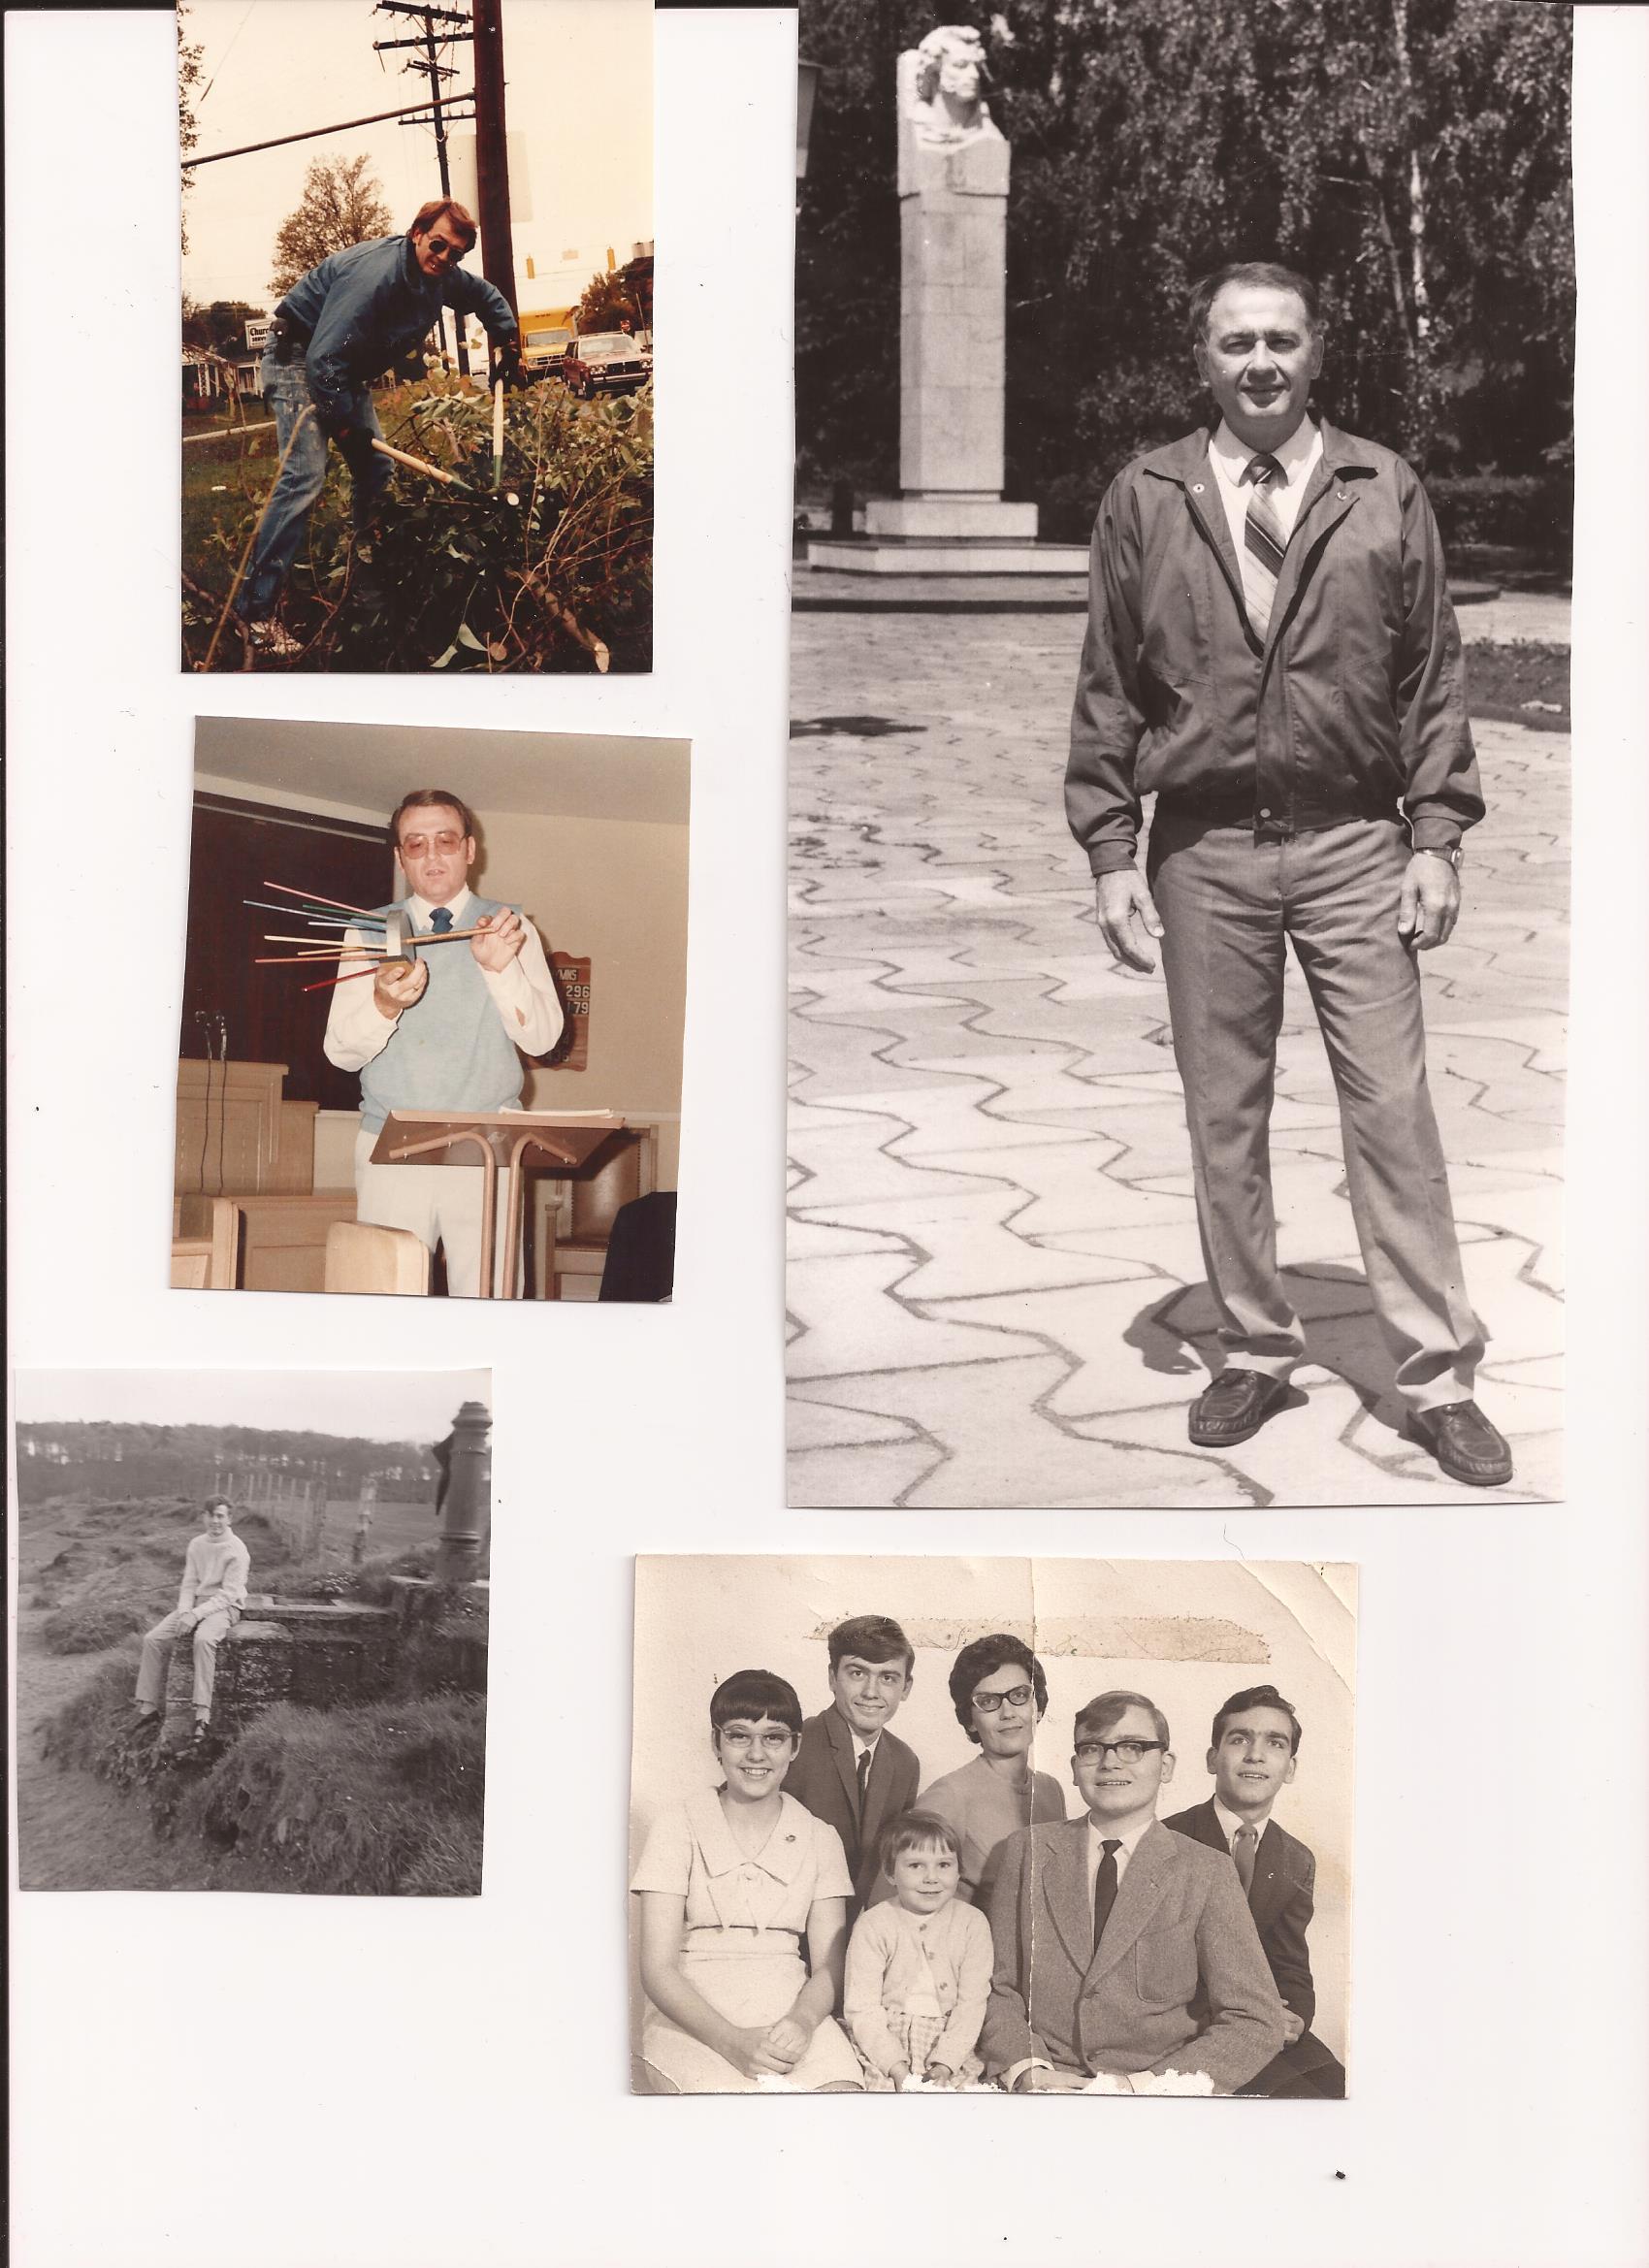 Jack Exum jr through the years